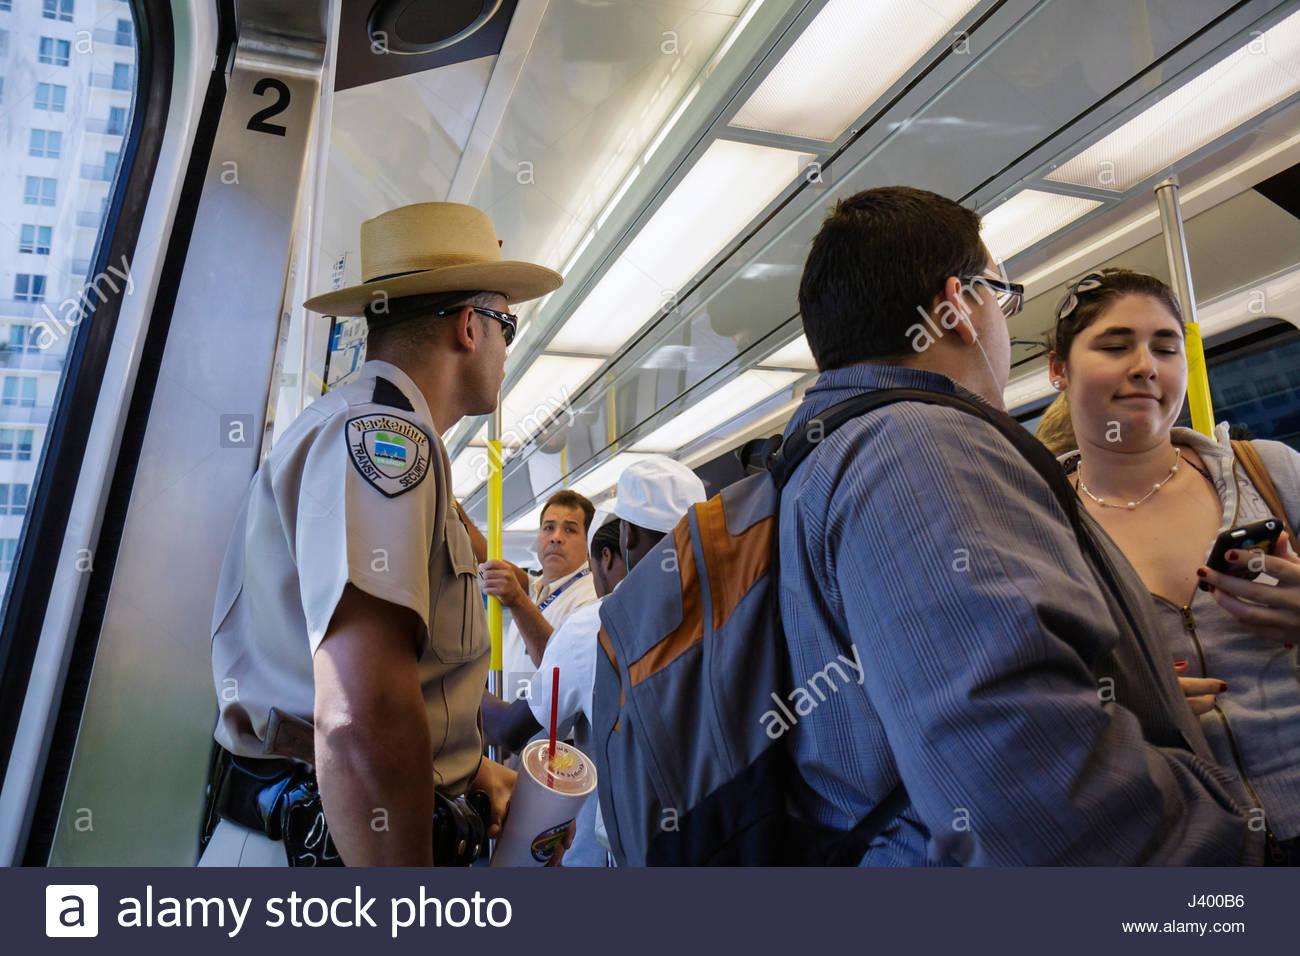 Miami Florida Metromover mass transit public transportation automated people mover Black Hispanic man woman security - Stock Image